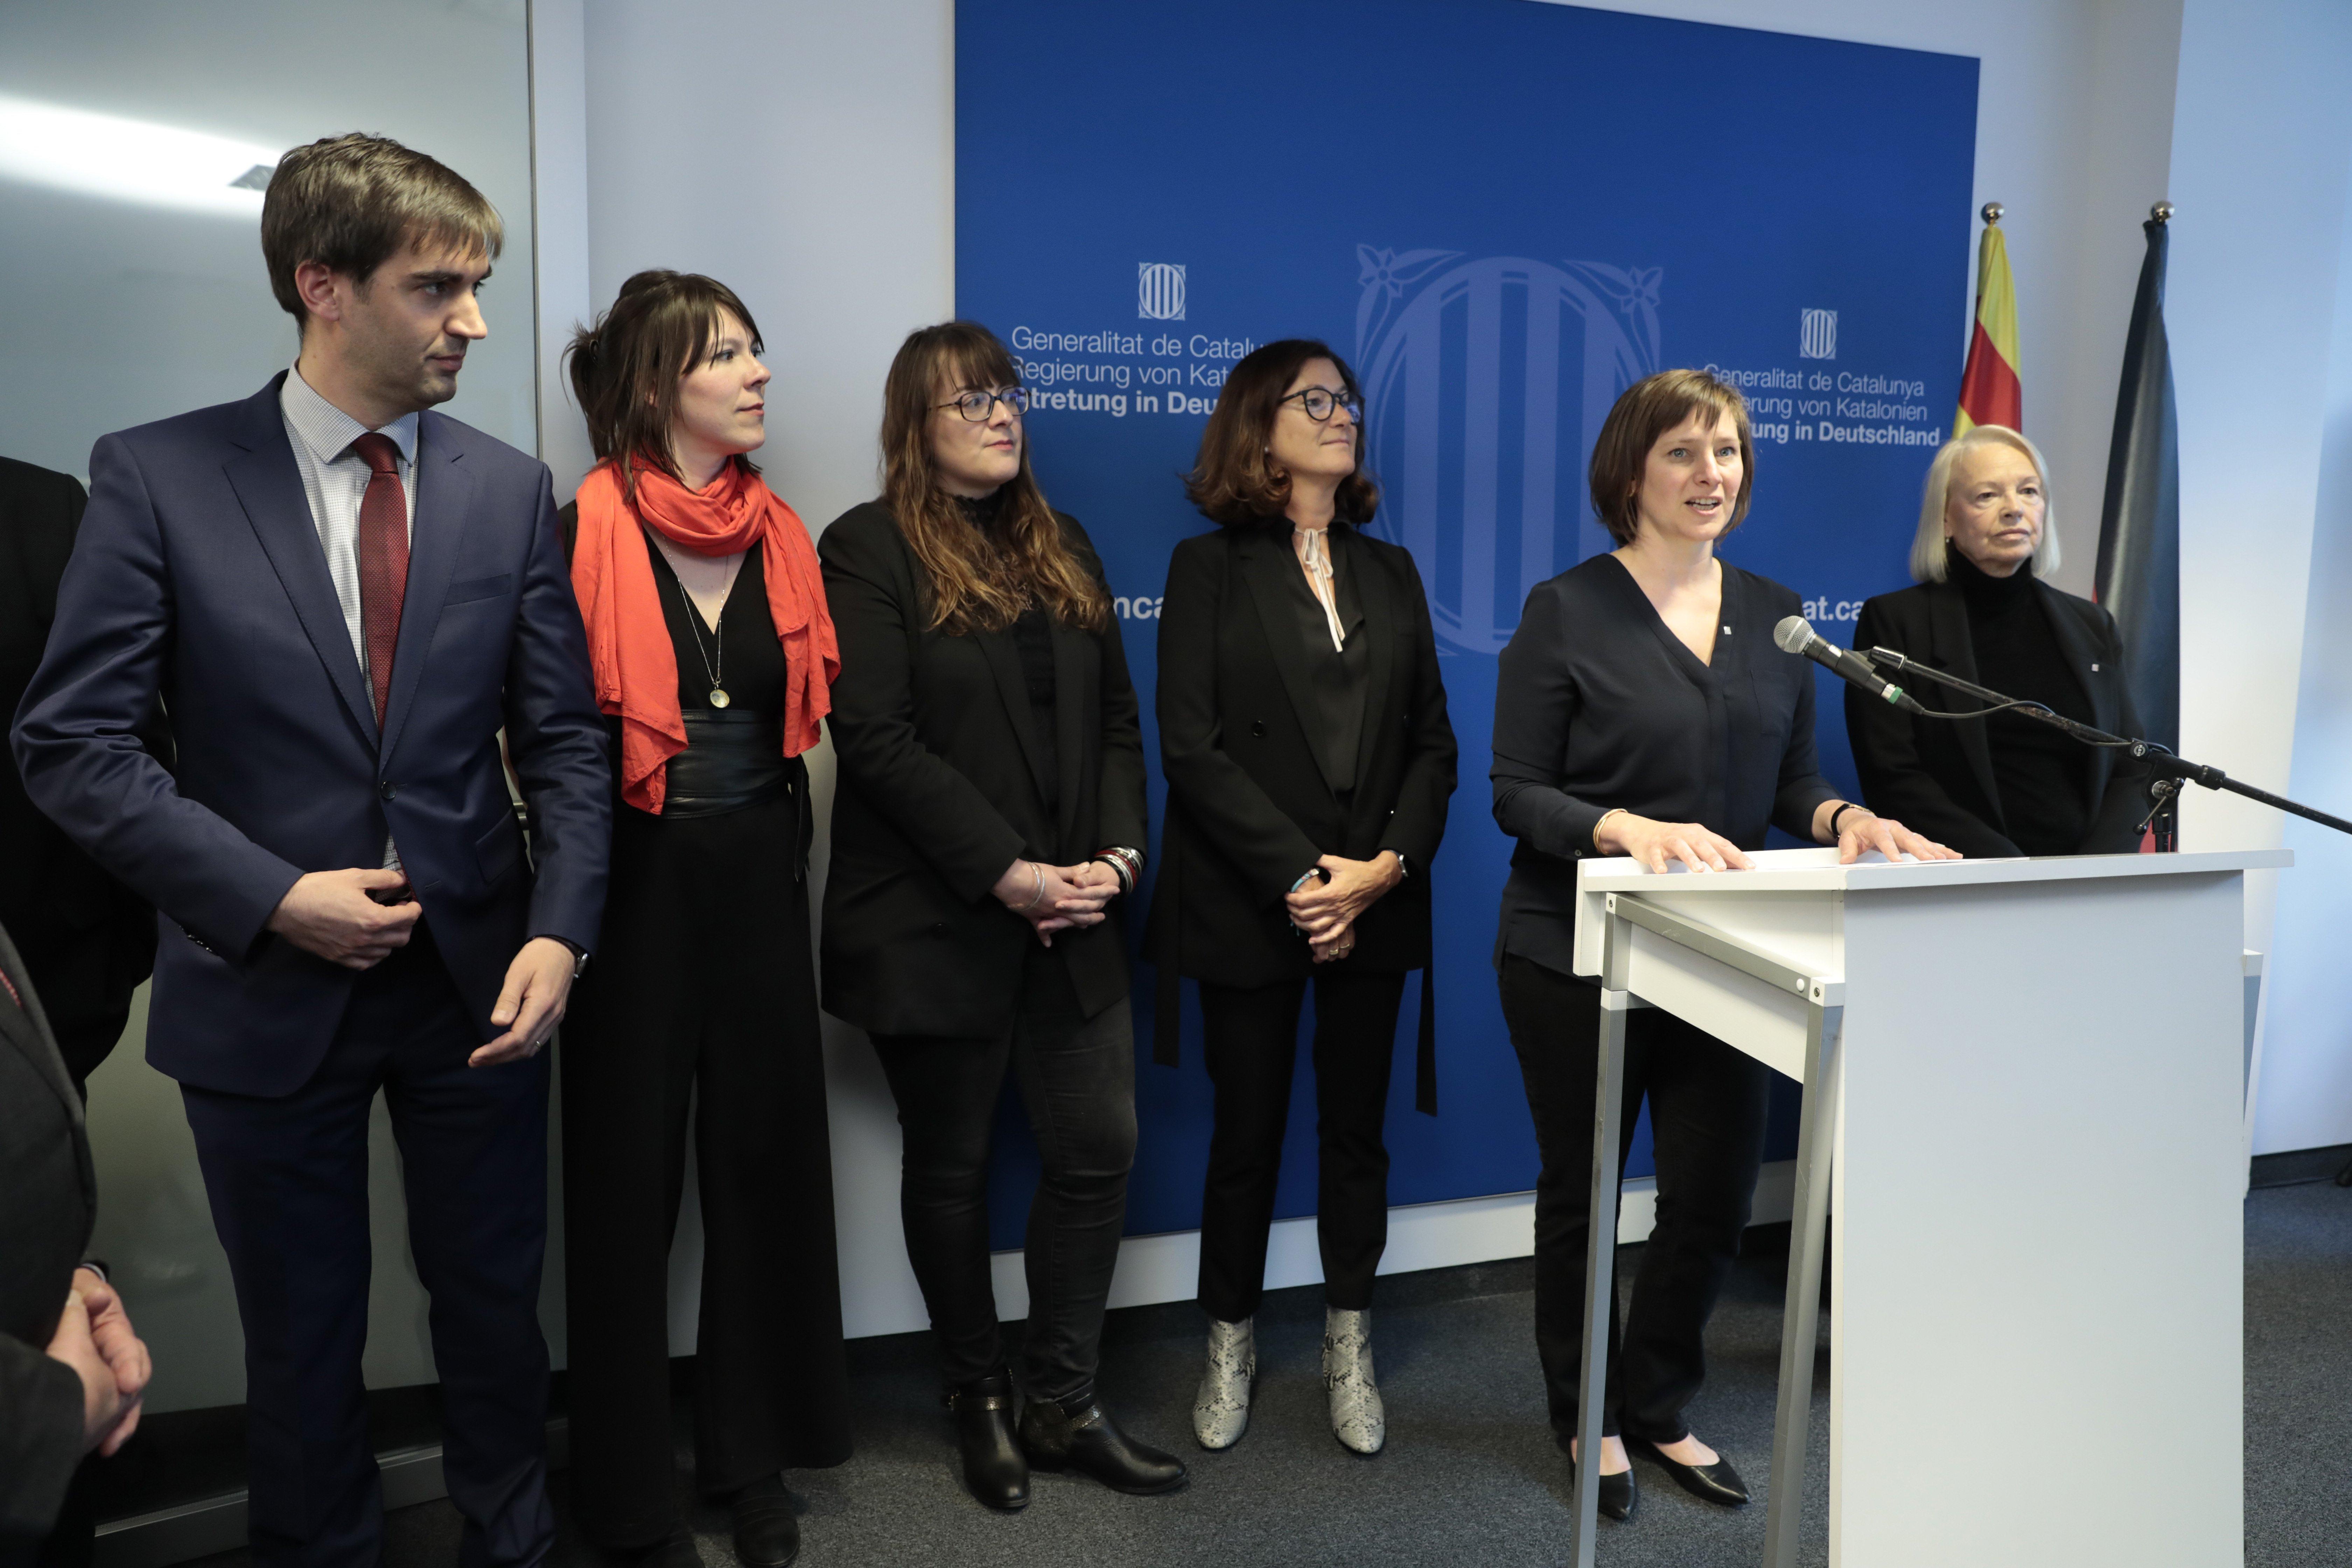 nova seu govern berlin gencat